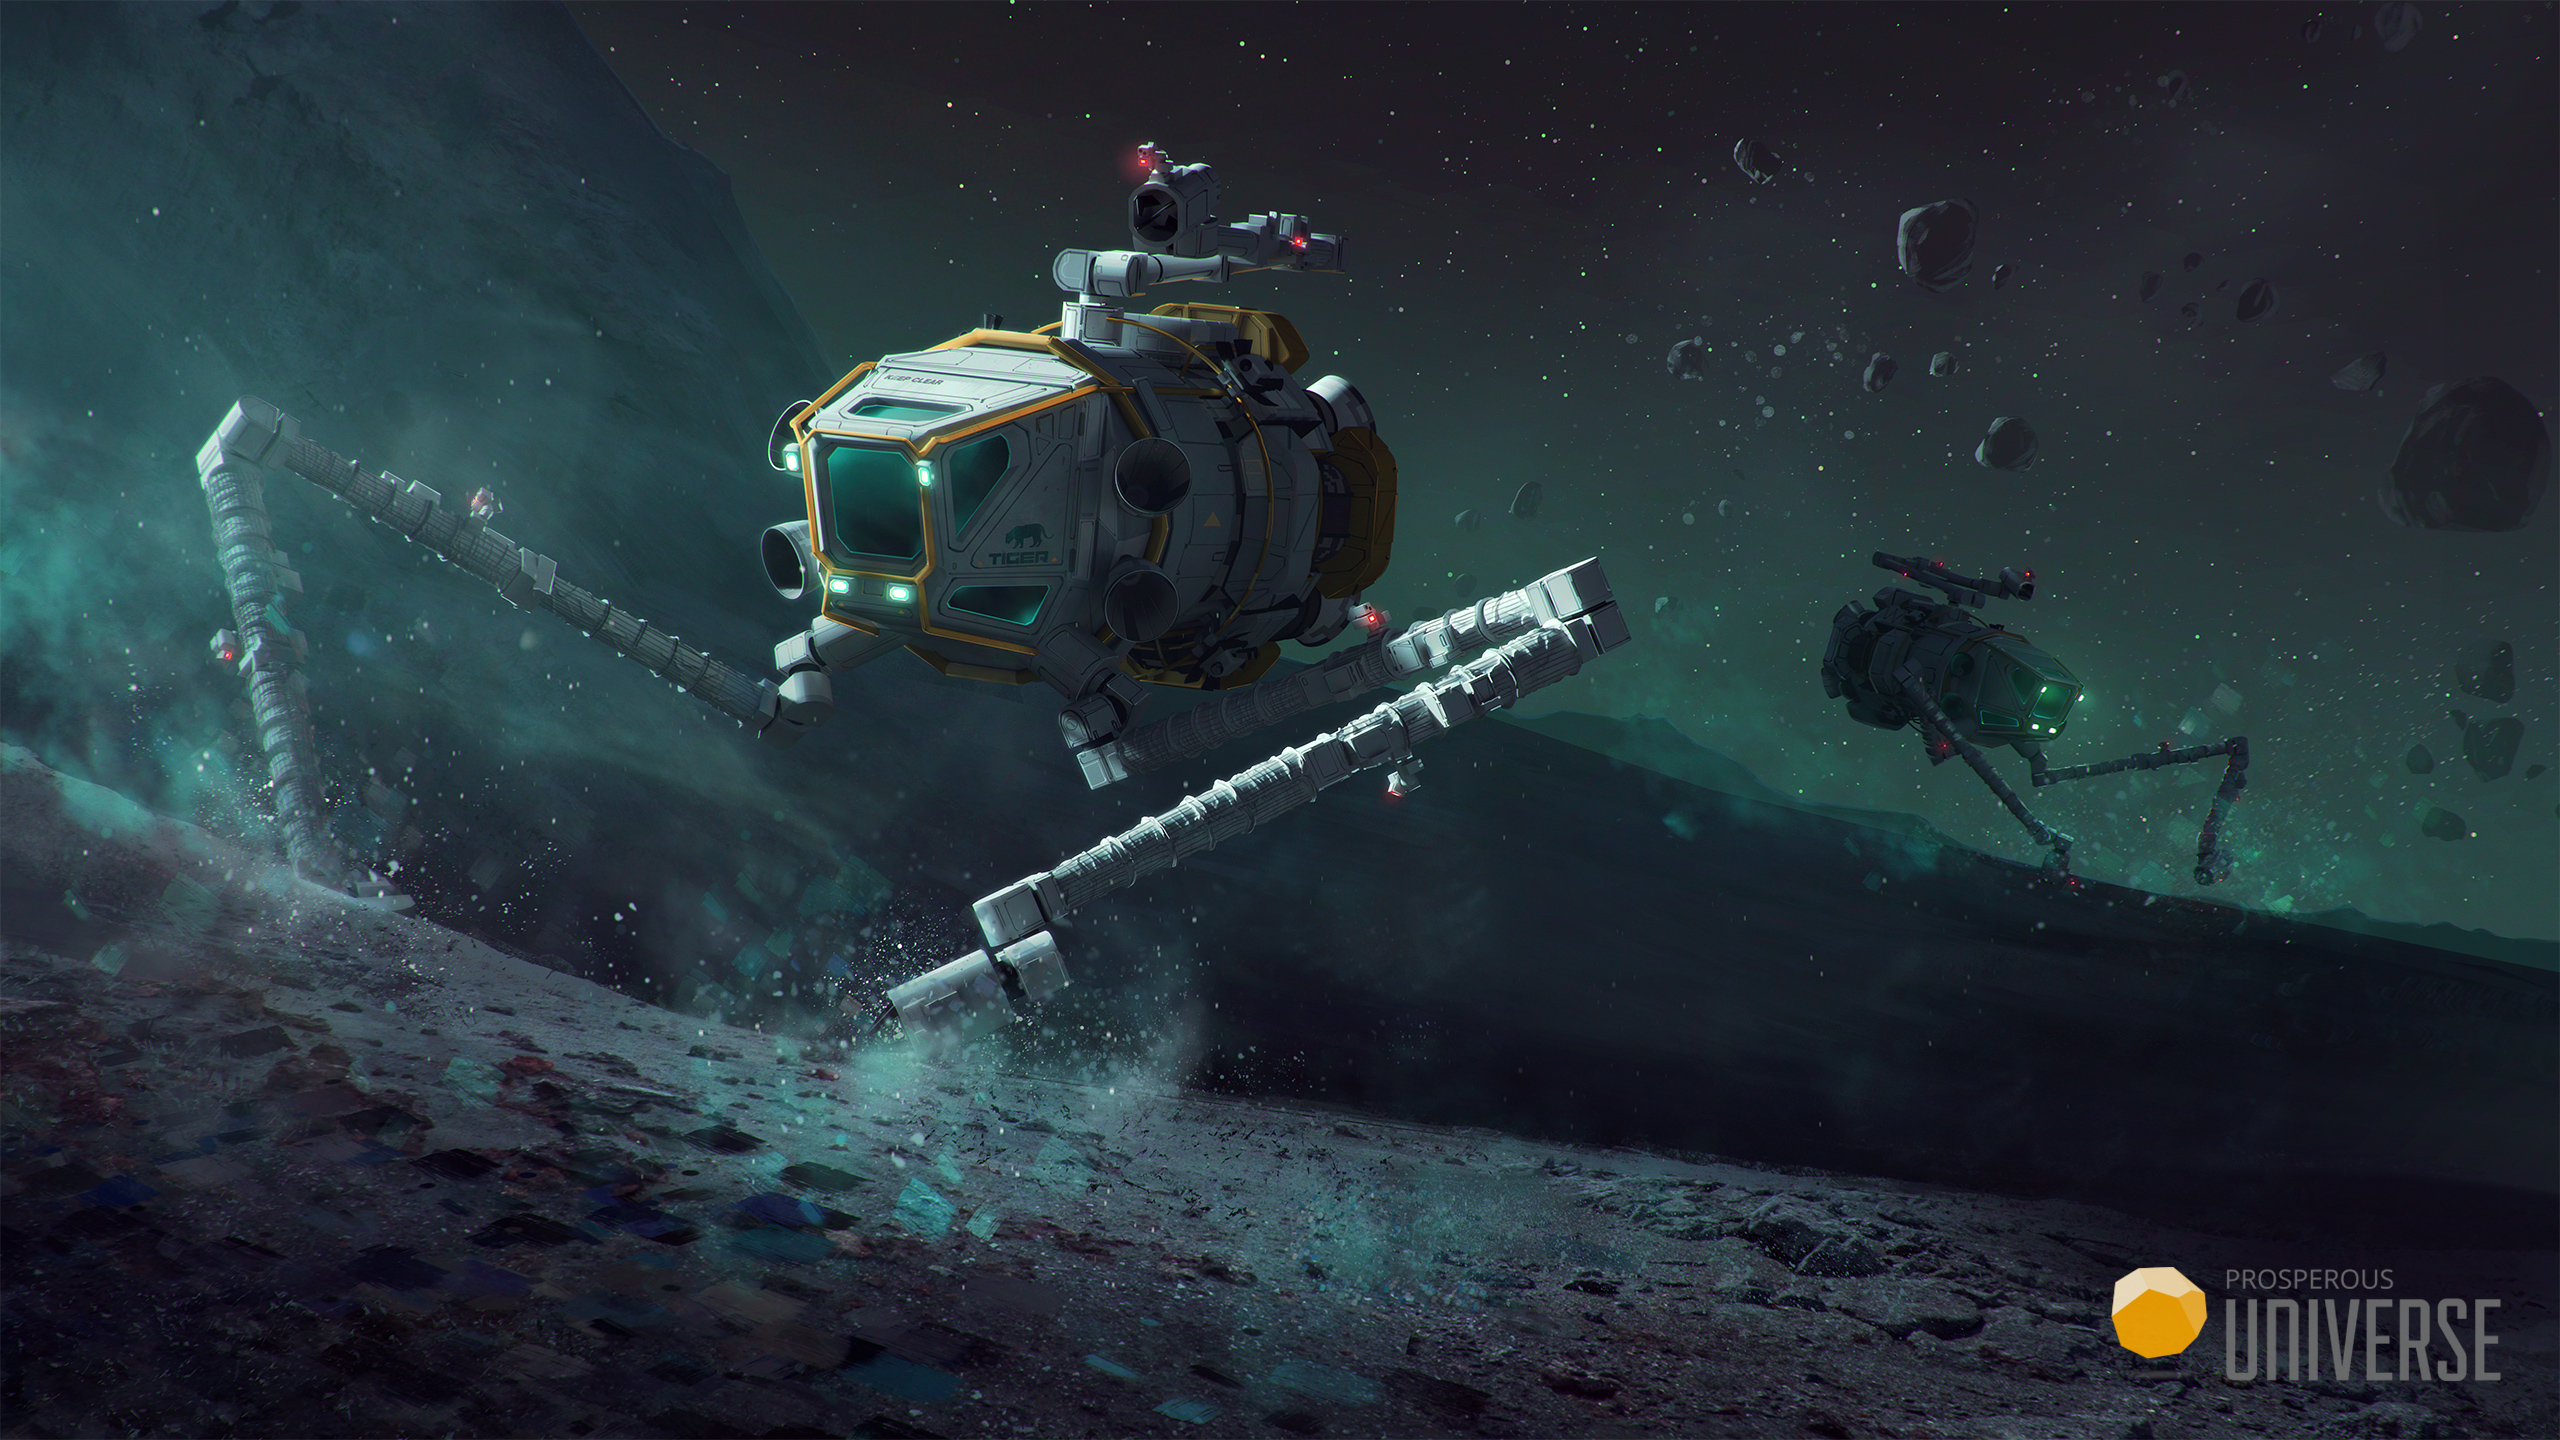 Prosperous Universe - concept art - asteroid day 2017.jpg